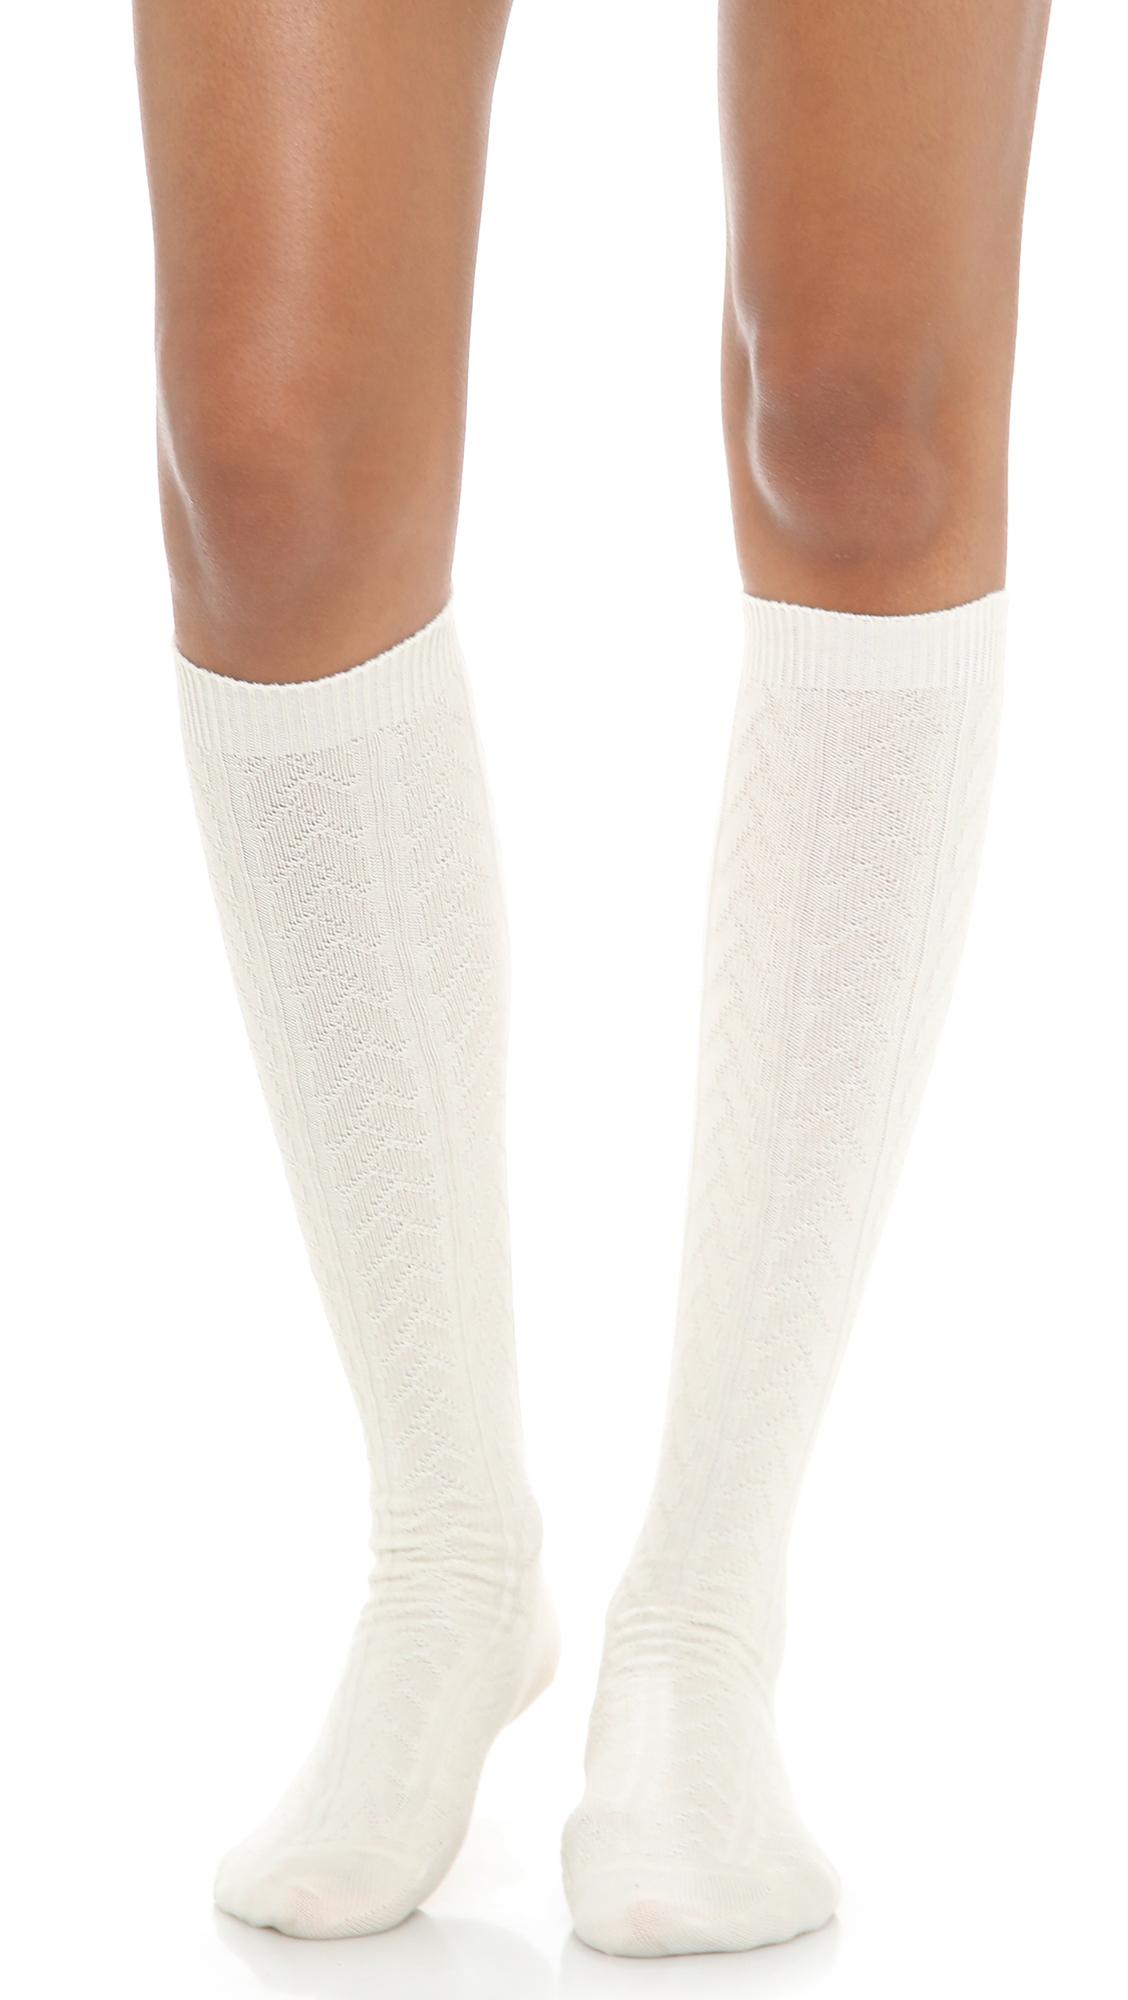 Lyst - Falke Striggings Cable Knit Knee High Socks - Grey in White